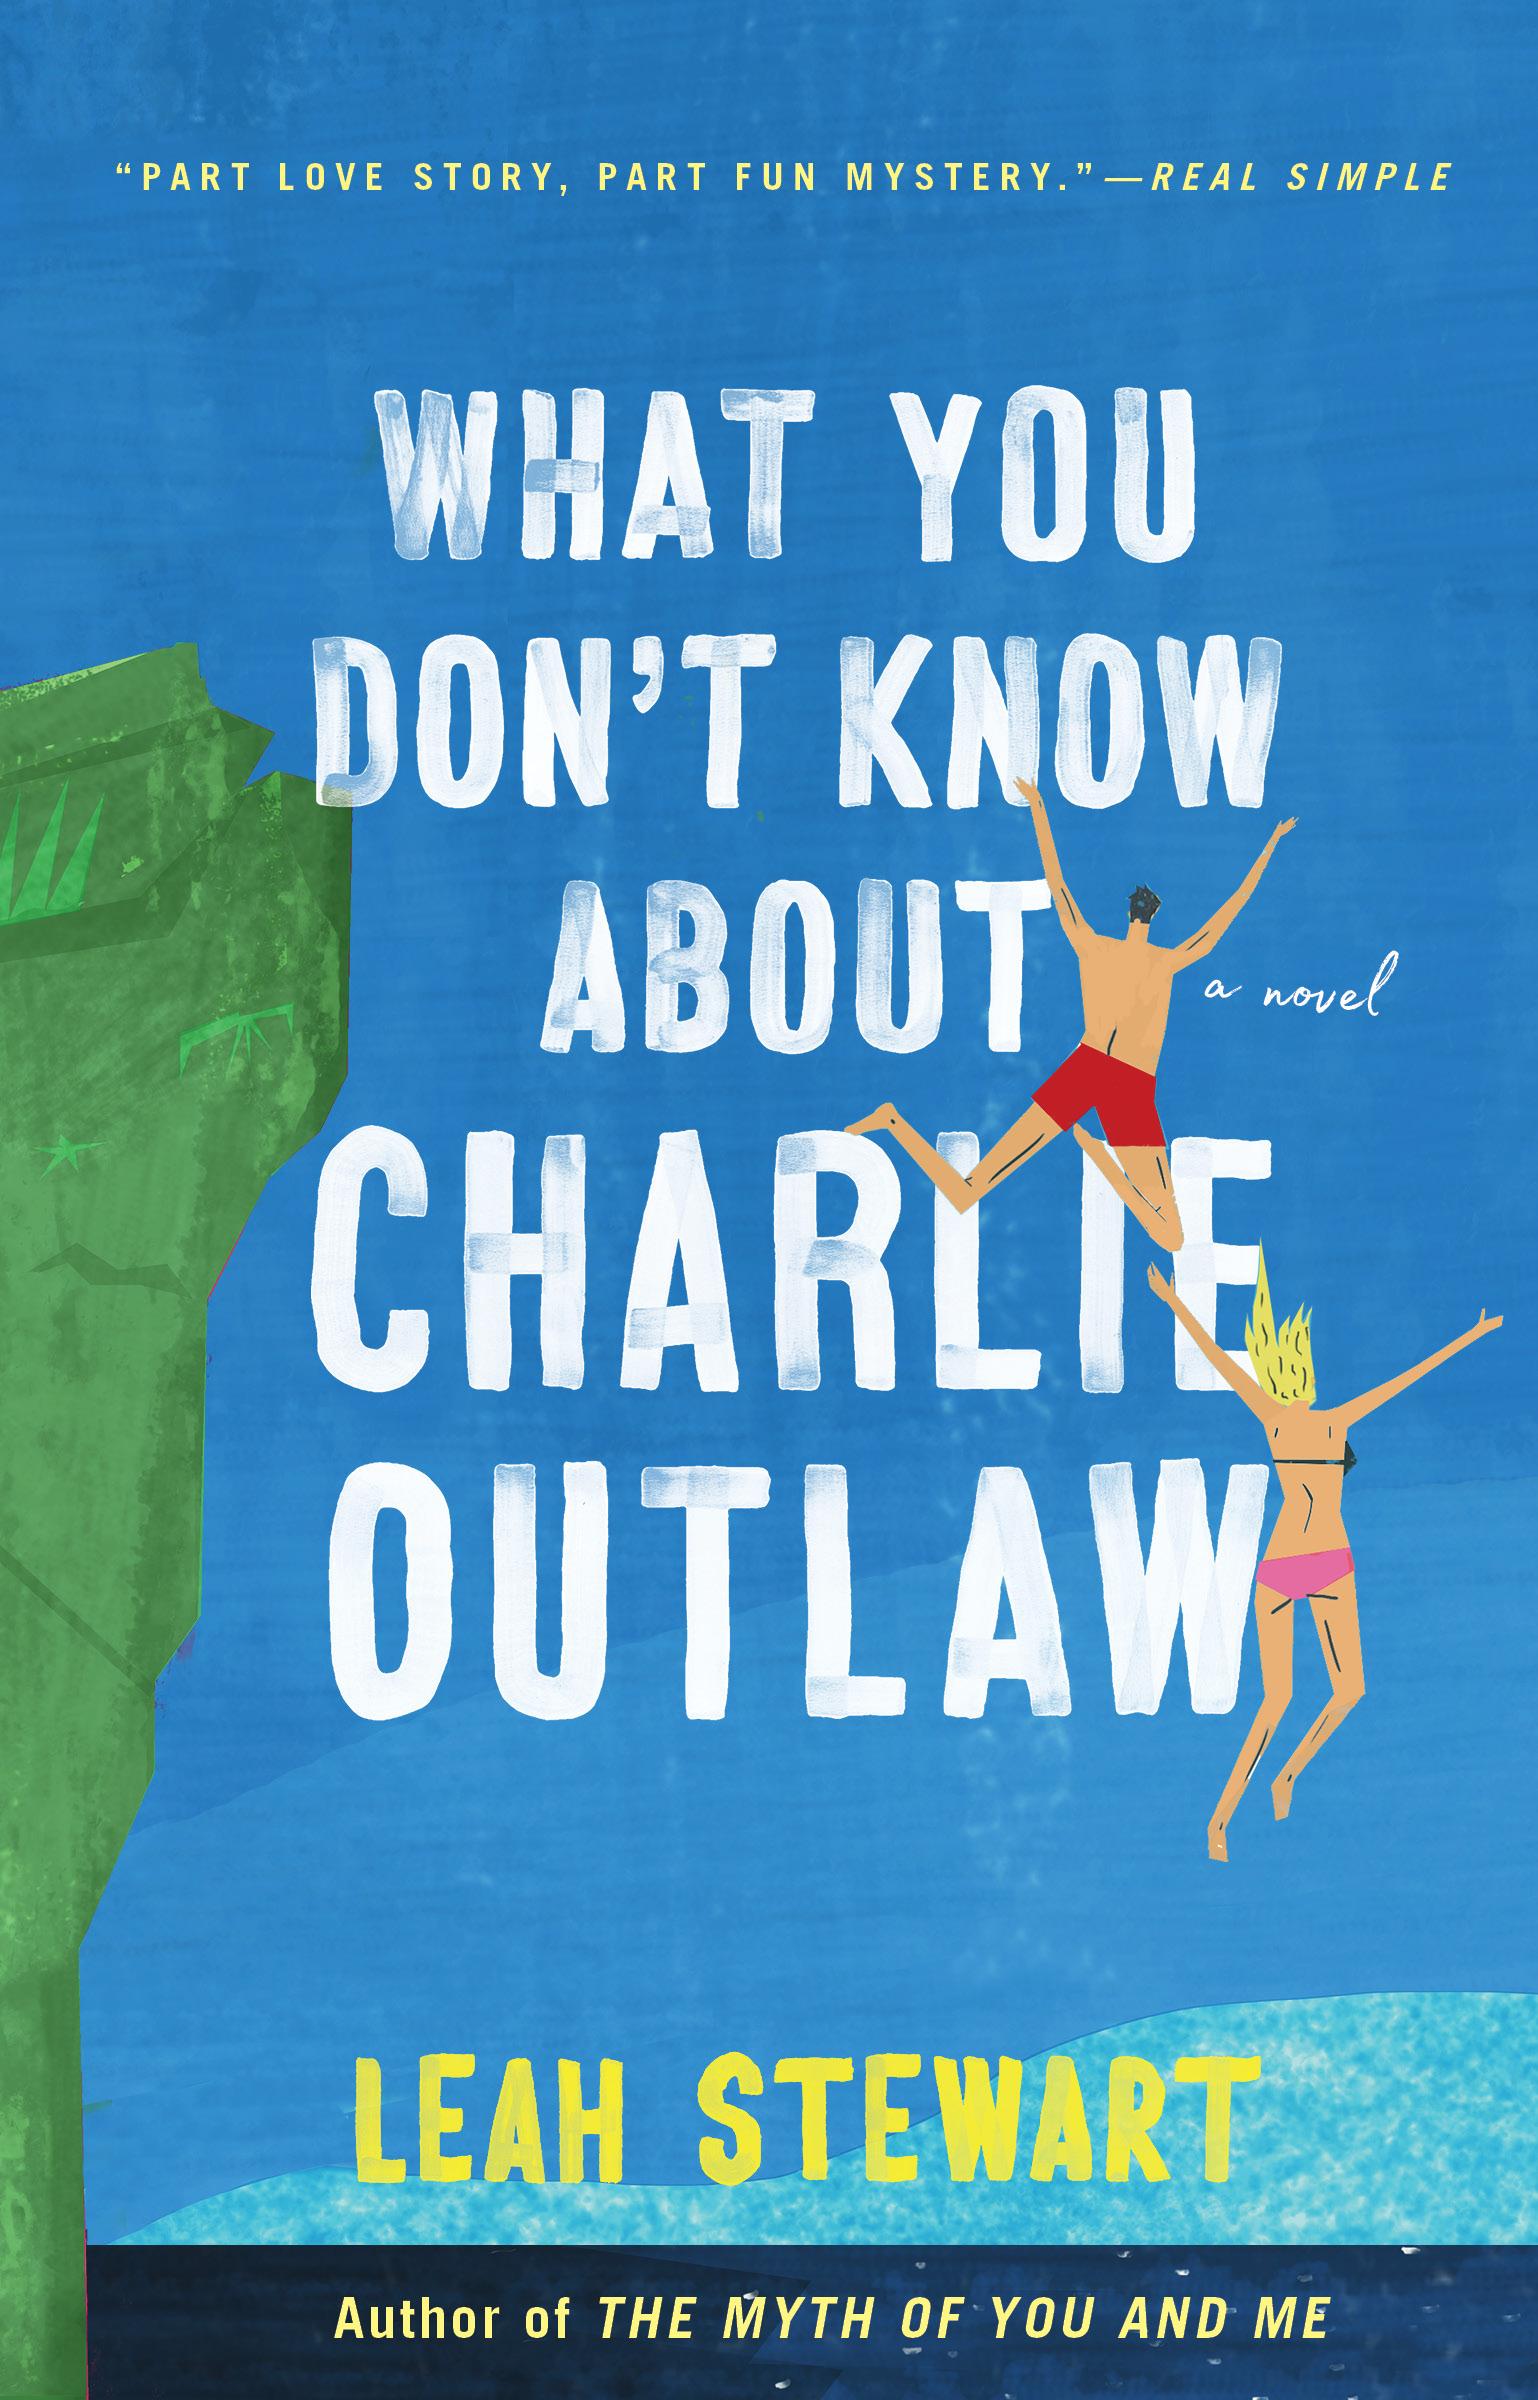 charlie outlow-paperback.jpg